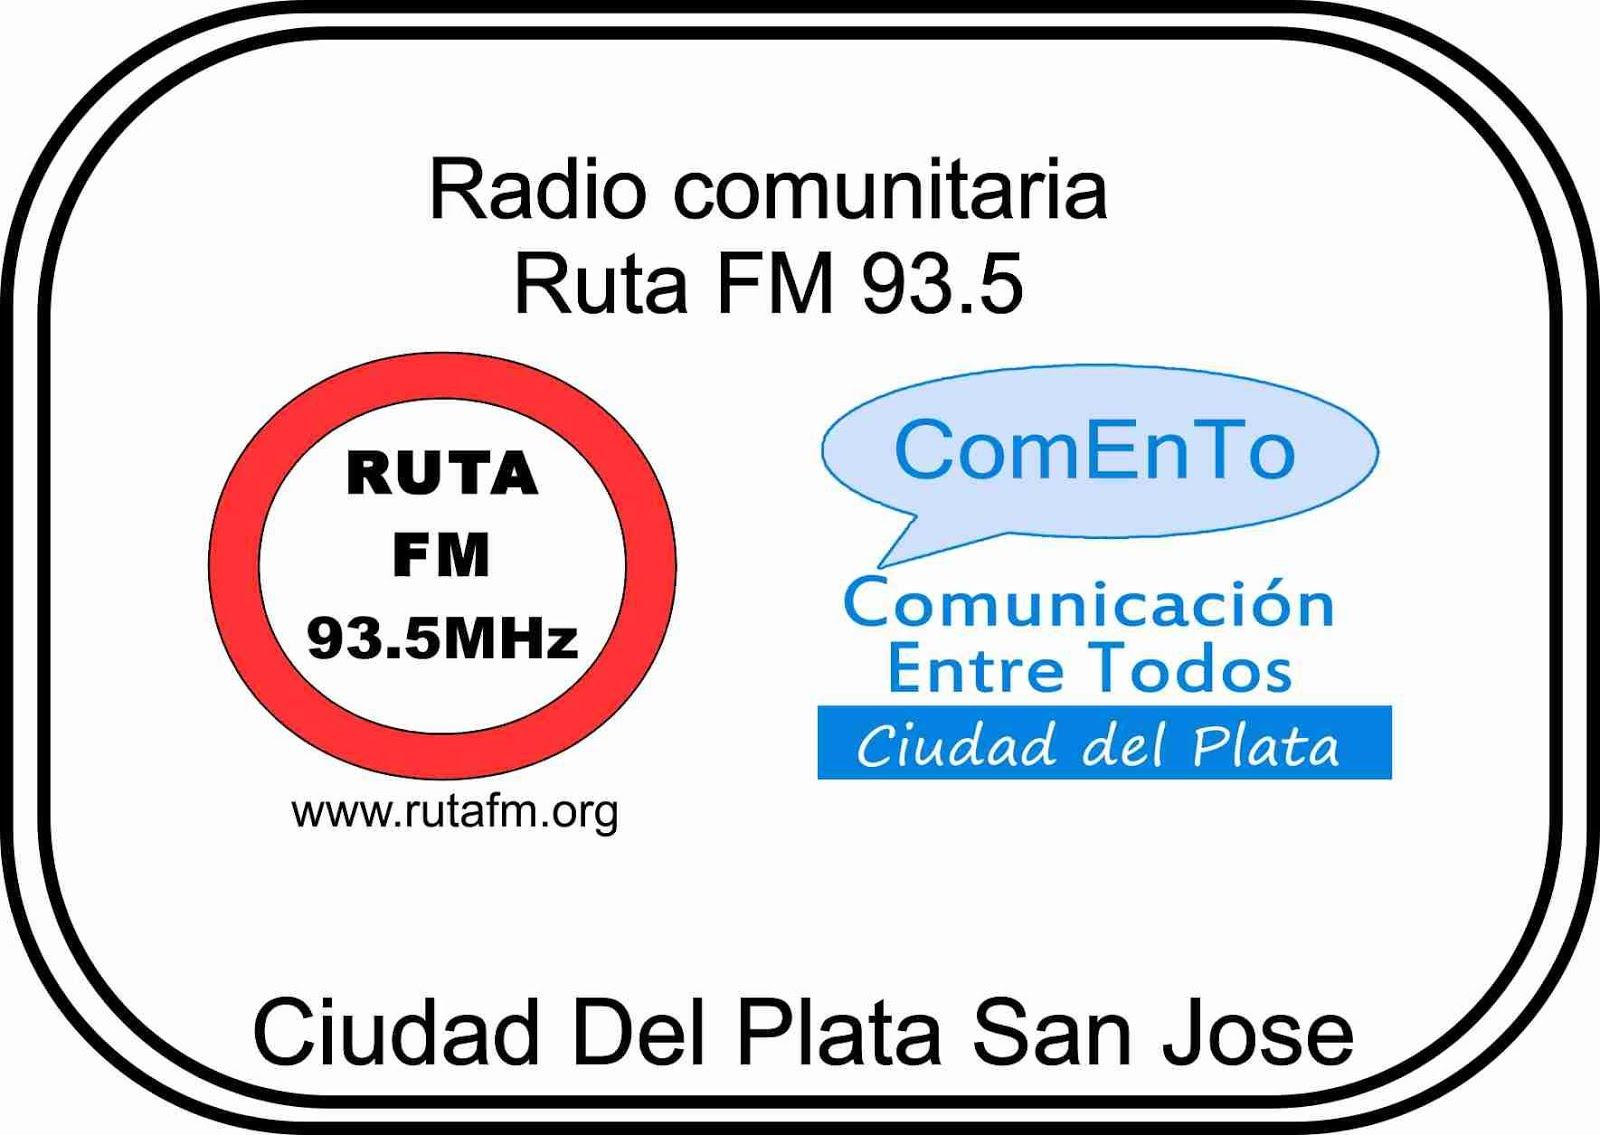 Ruta FM 93.5